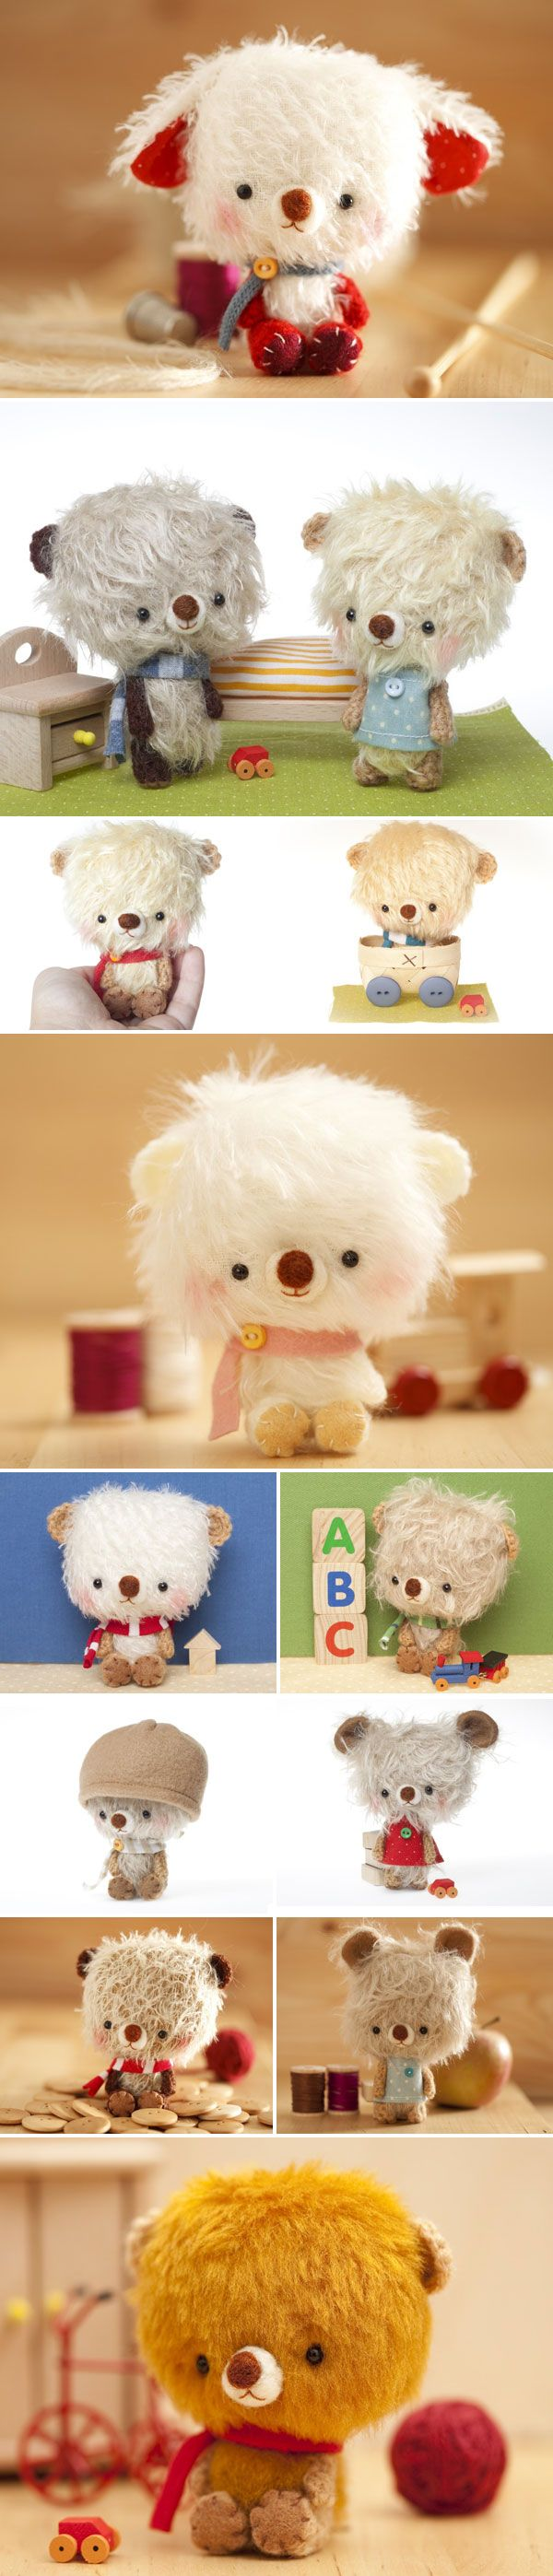 Handmade big headed teddy bears